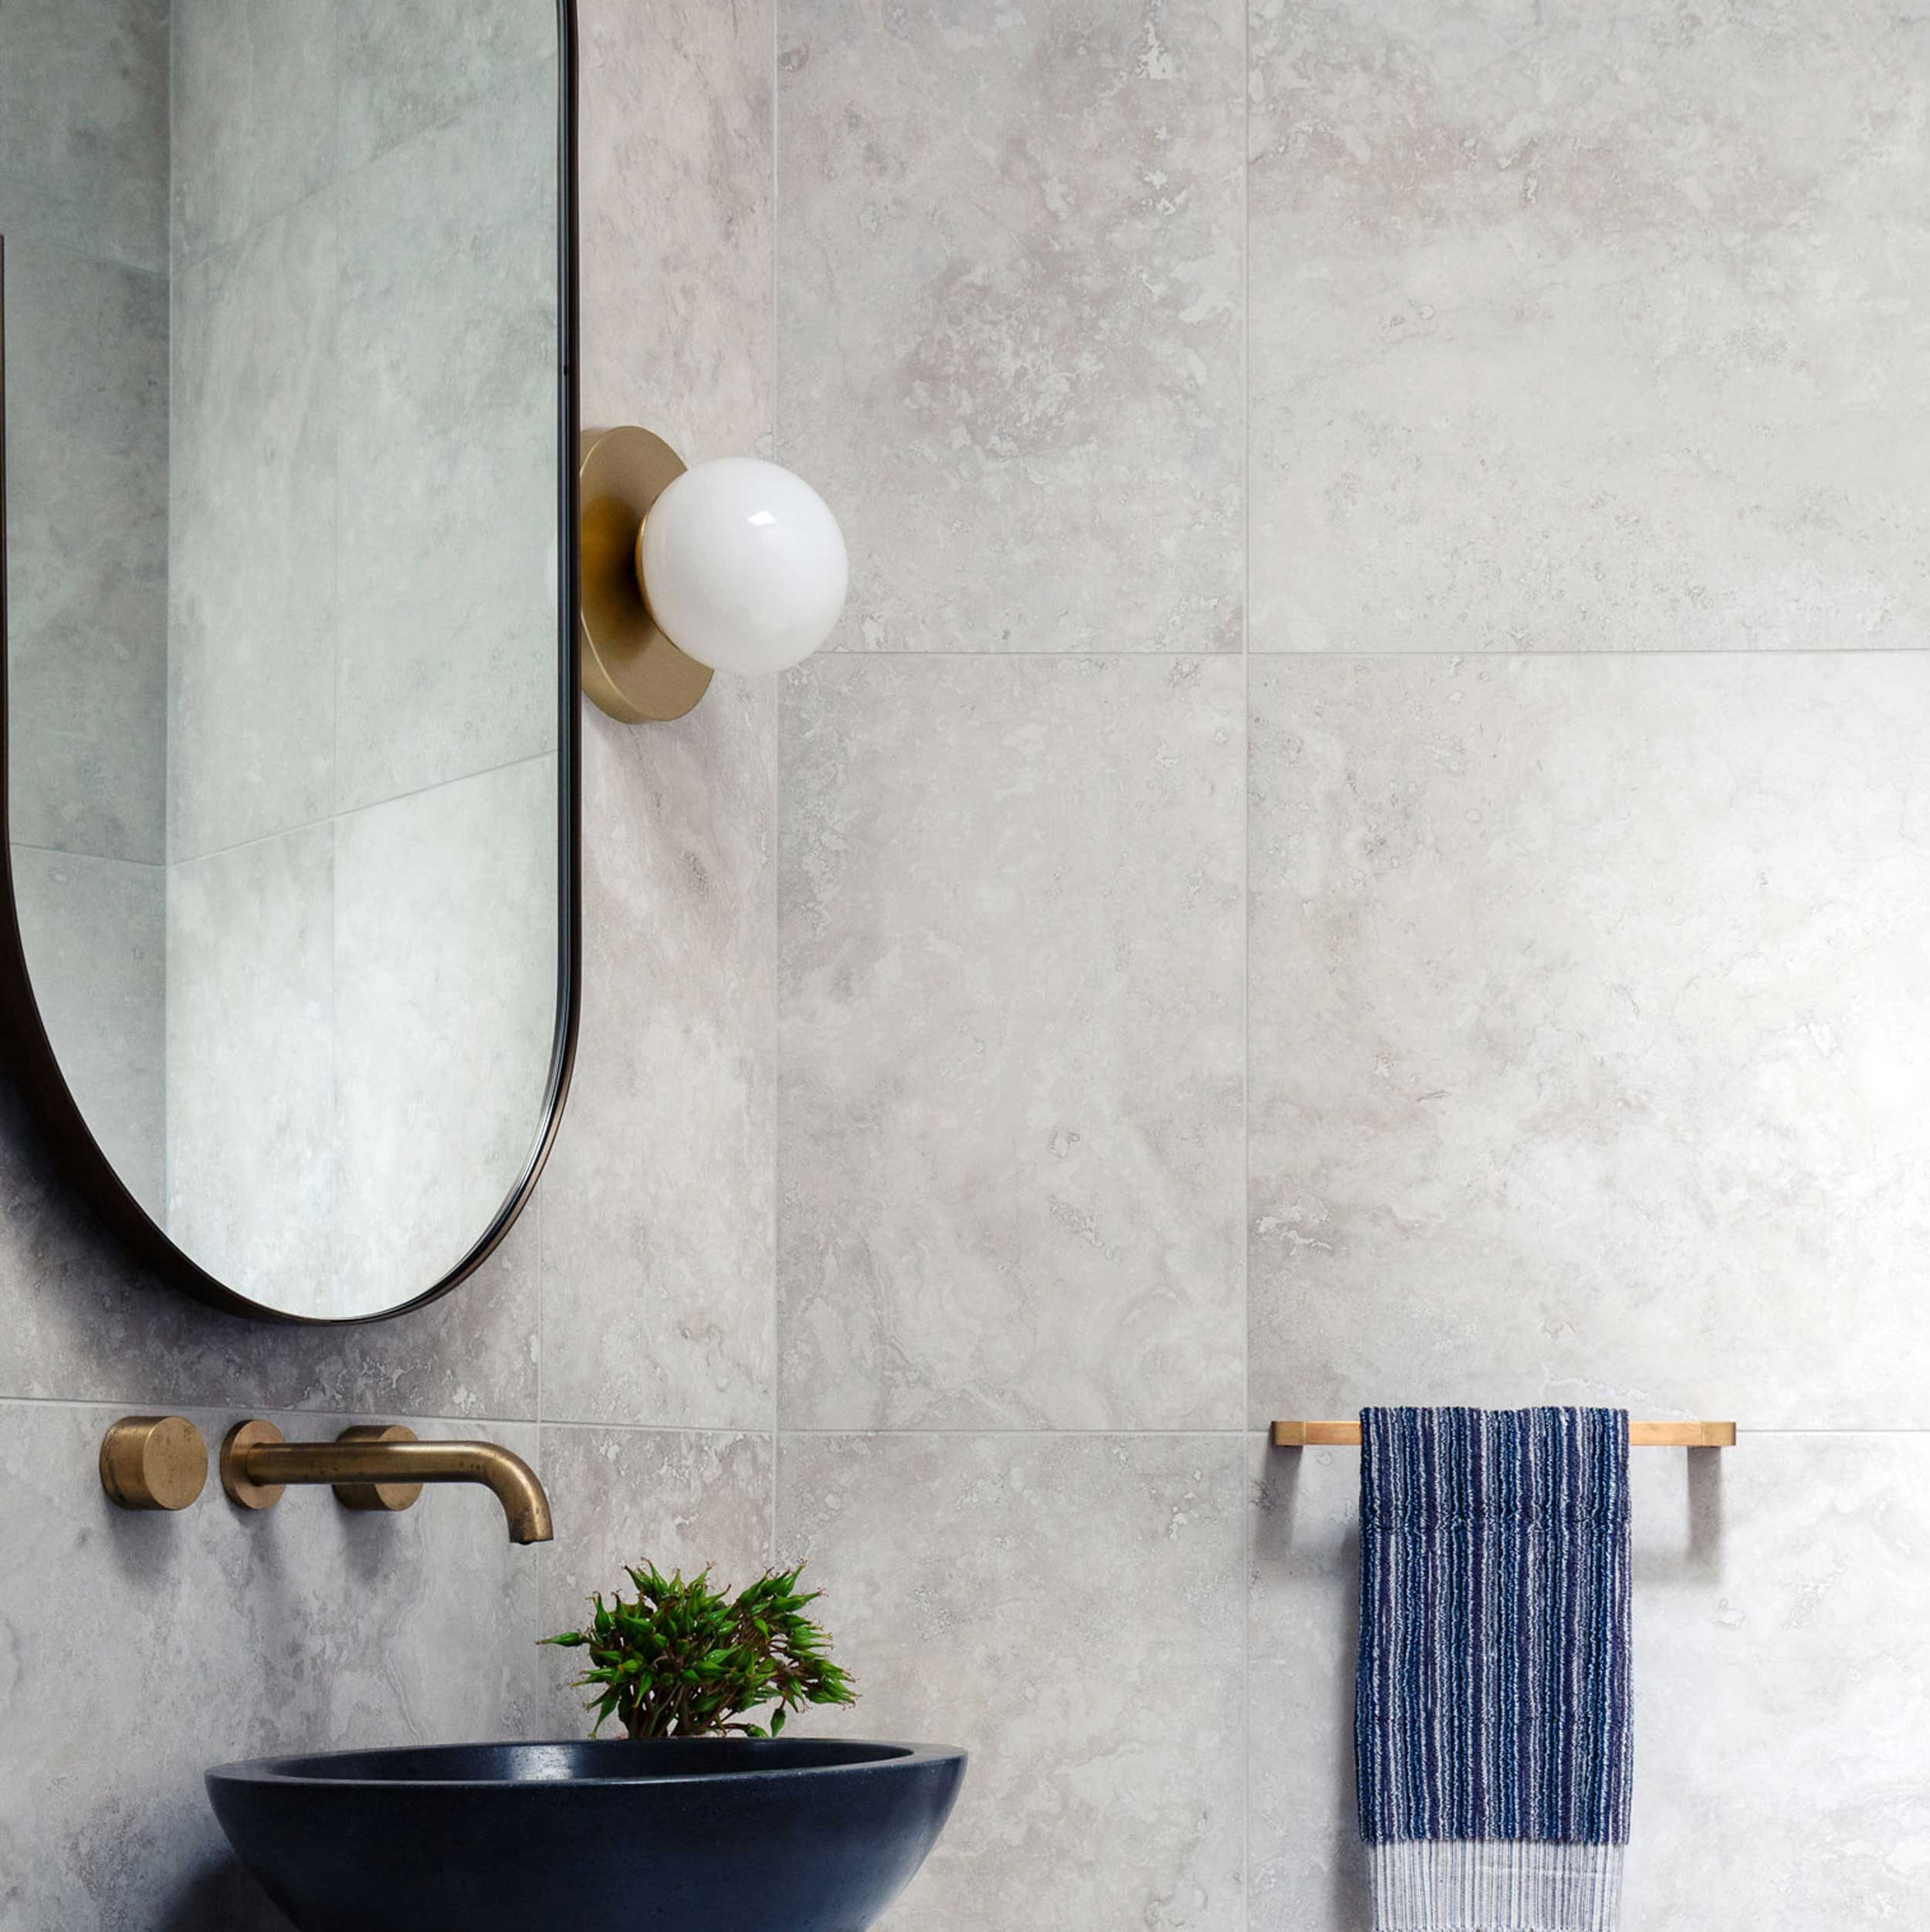 porcelain tiles, porcelain floor tiles, stone look tile, stone look tiles, stone look porcelain tile, stone look tile for walls, stone look tile floor